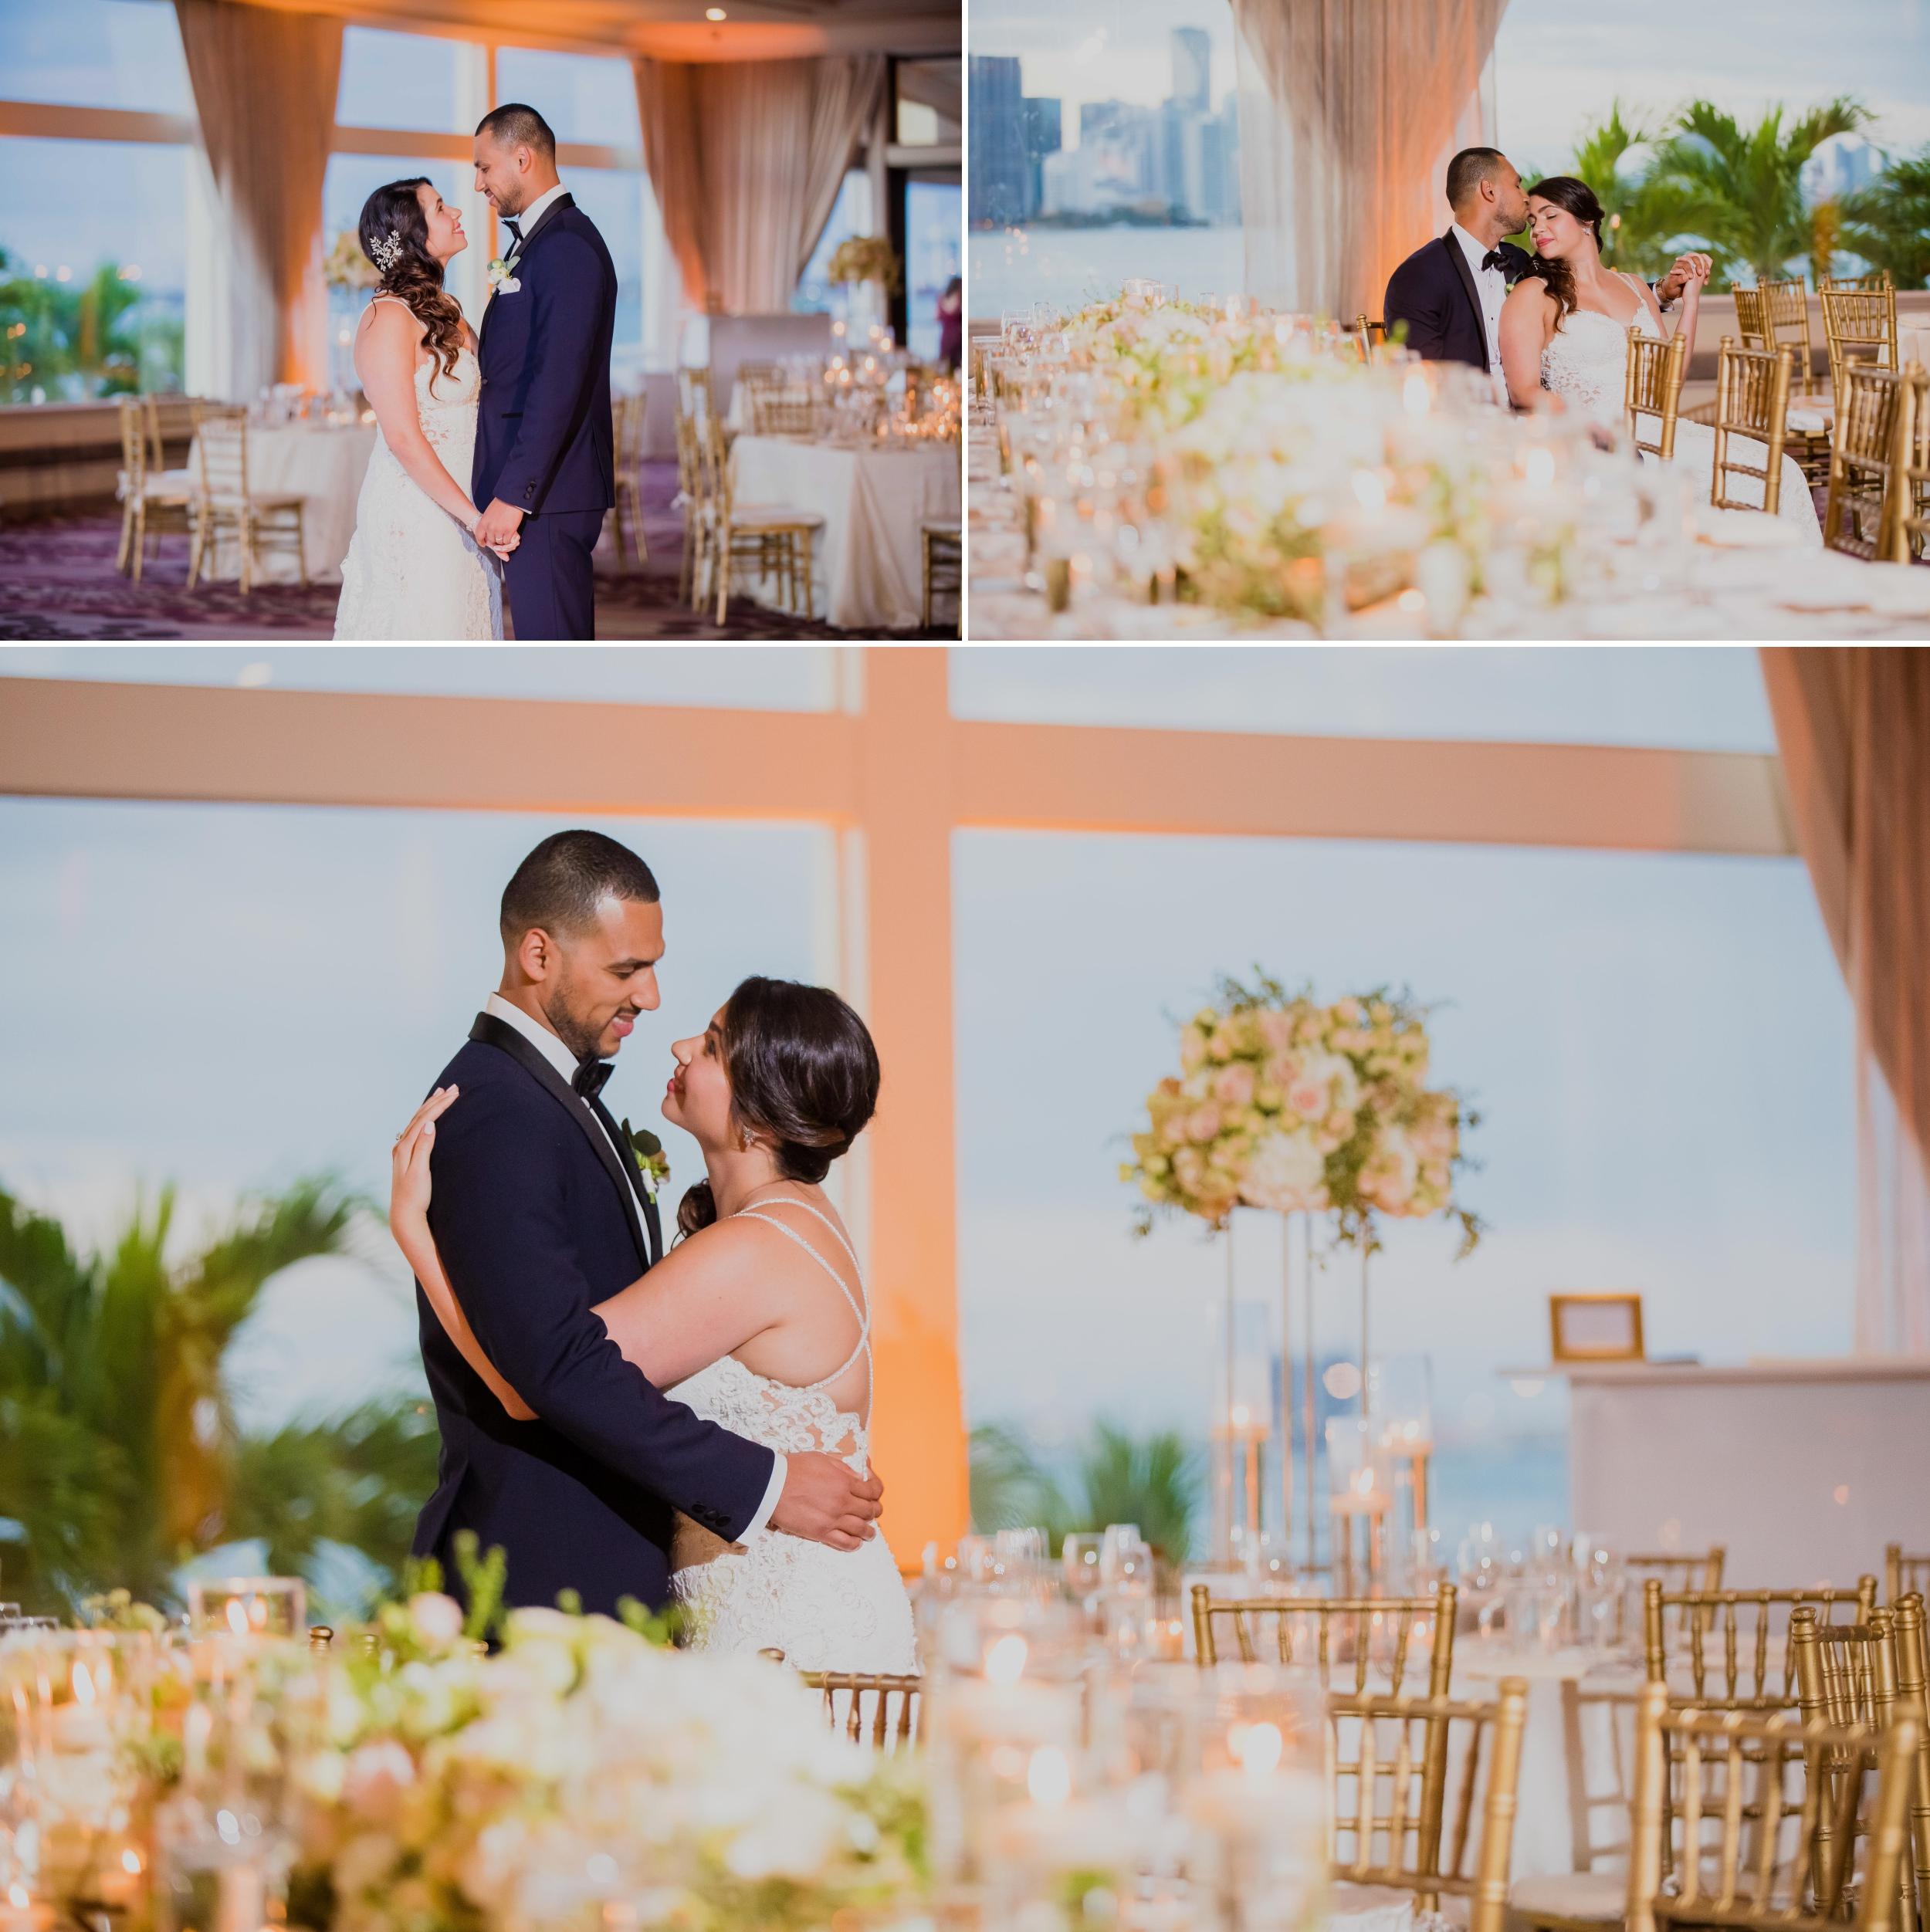 Wedding - Rusty Pelican - Key Biscayne - Santy Martinez Photography 35.jpg